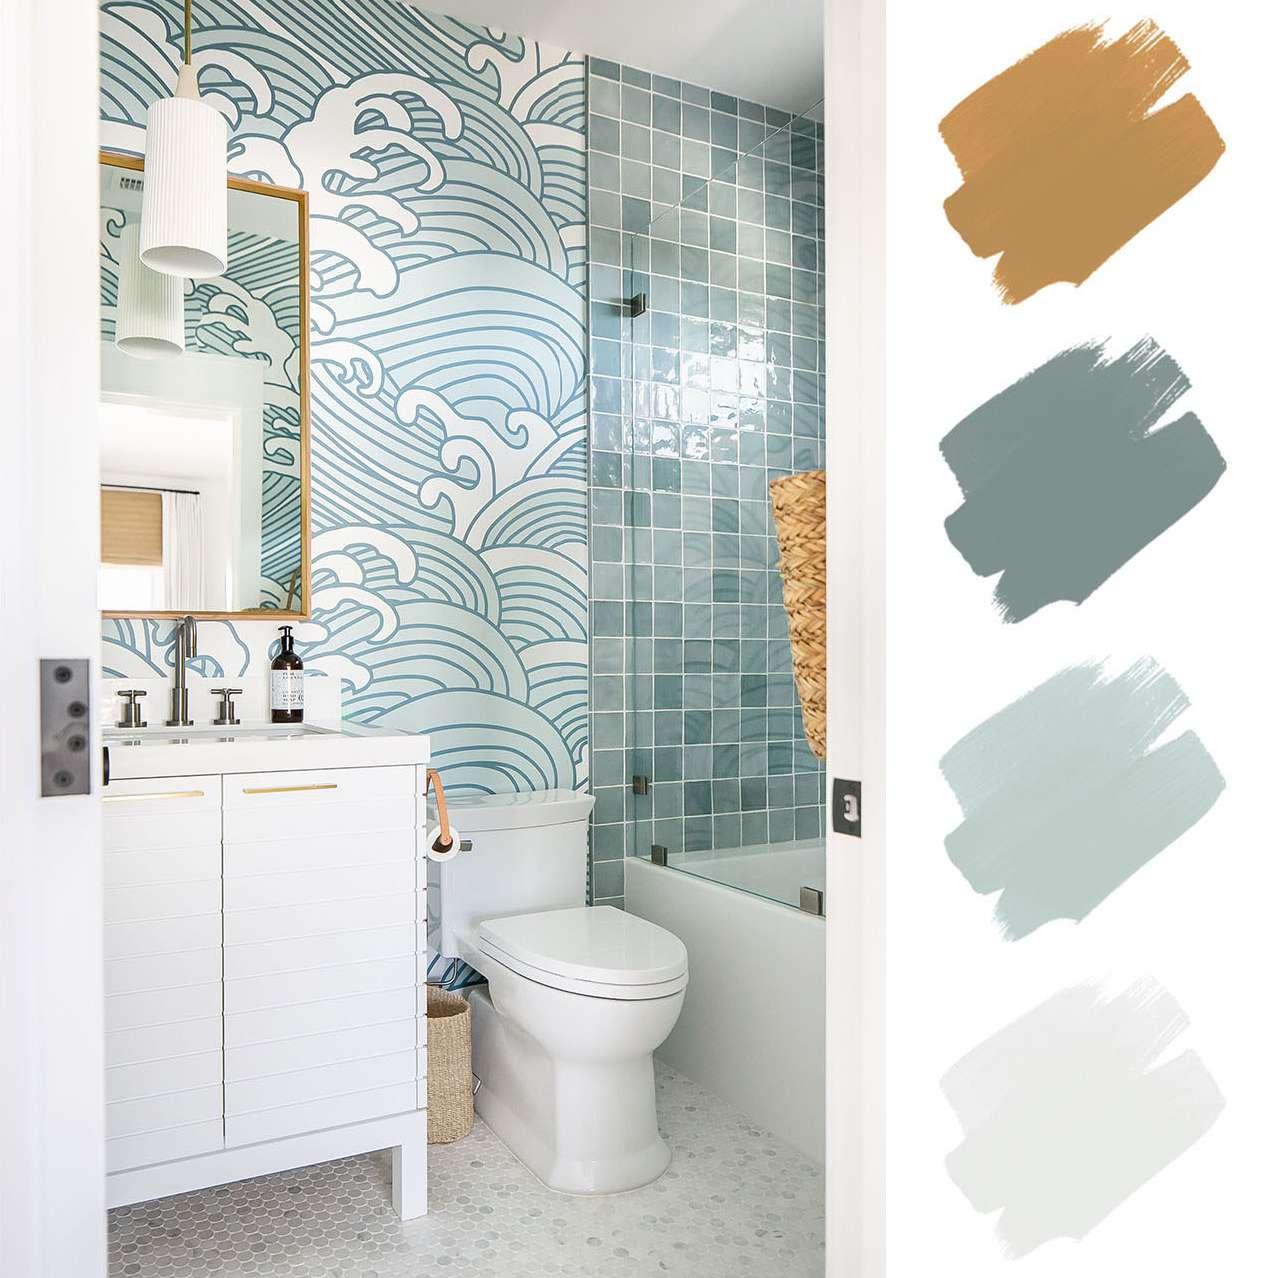 6 Beautiful Bathroom Color Schemes, Color Scheme Ideas For Bathrooms